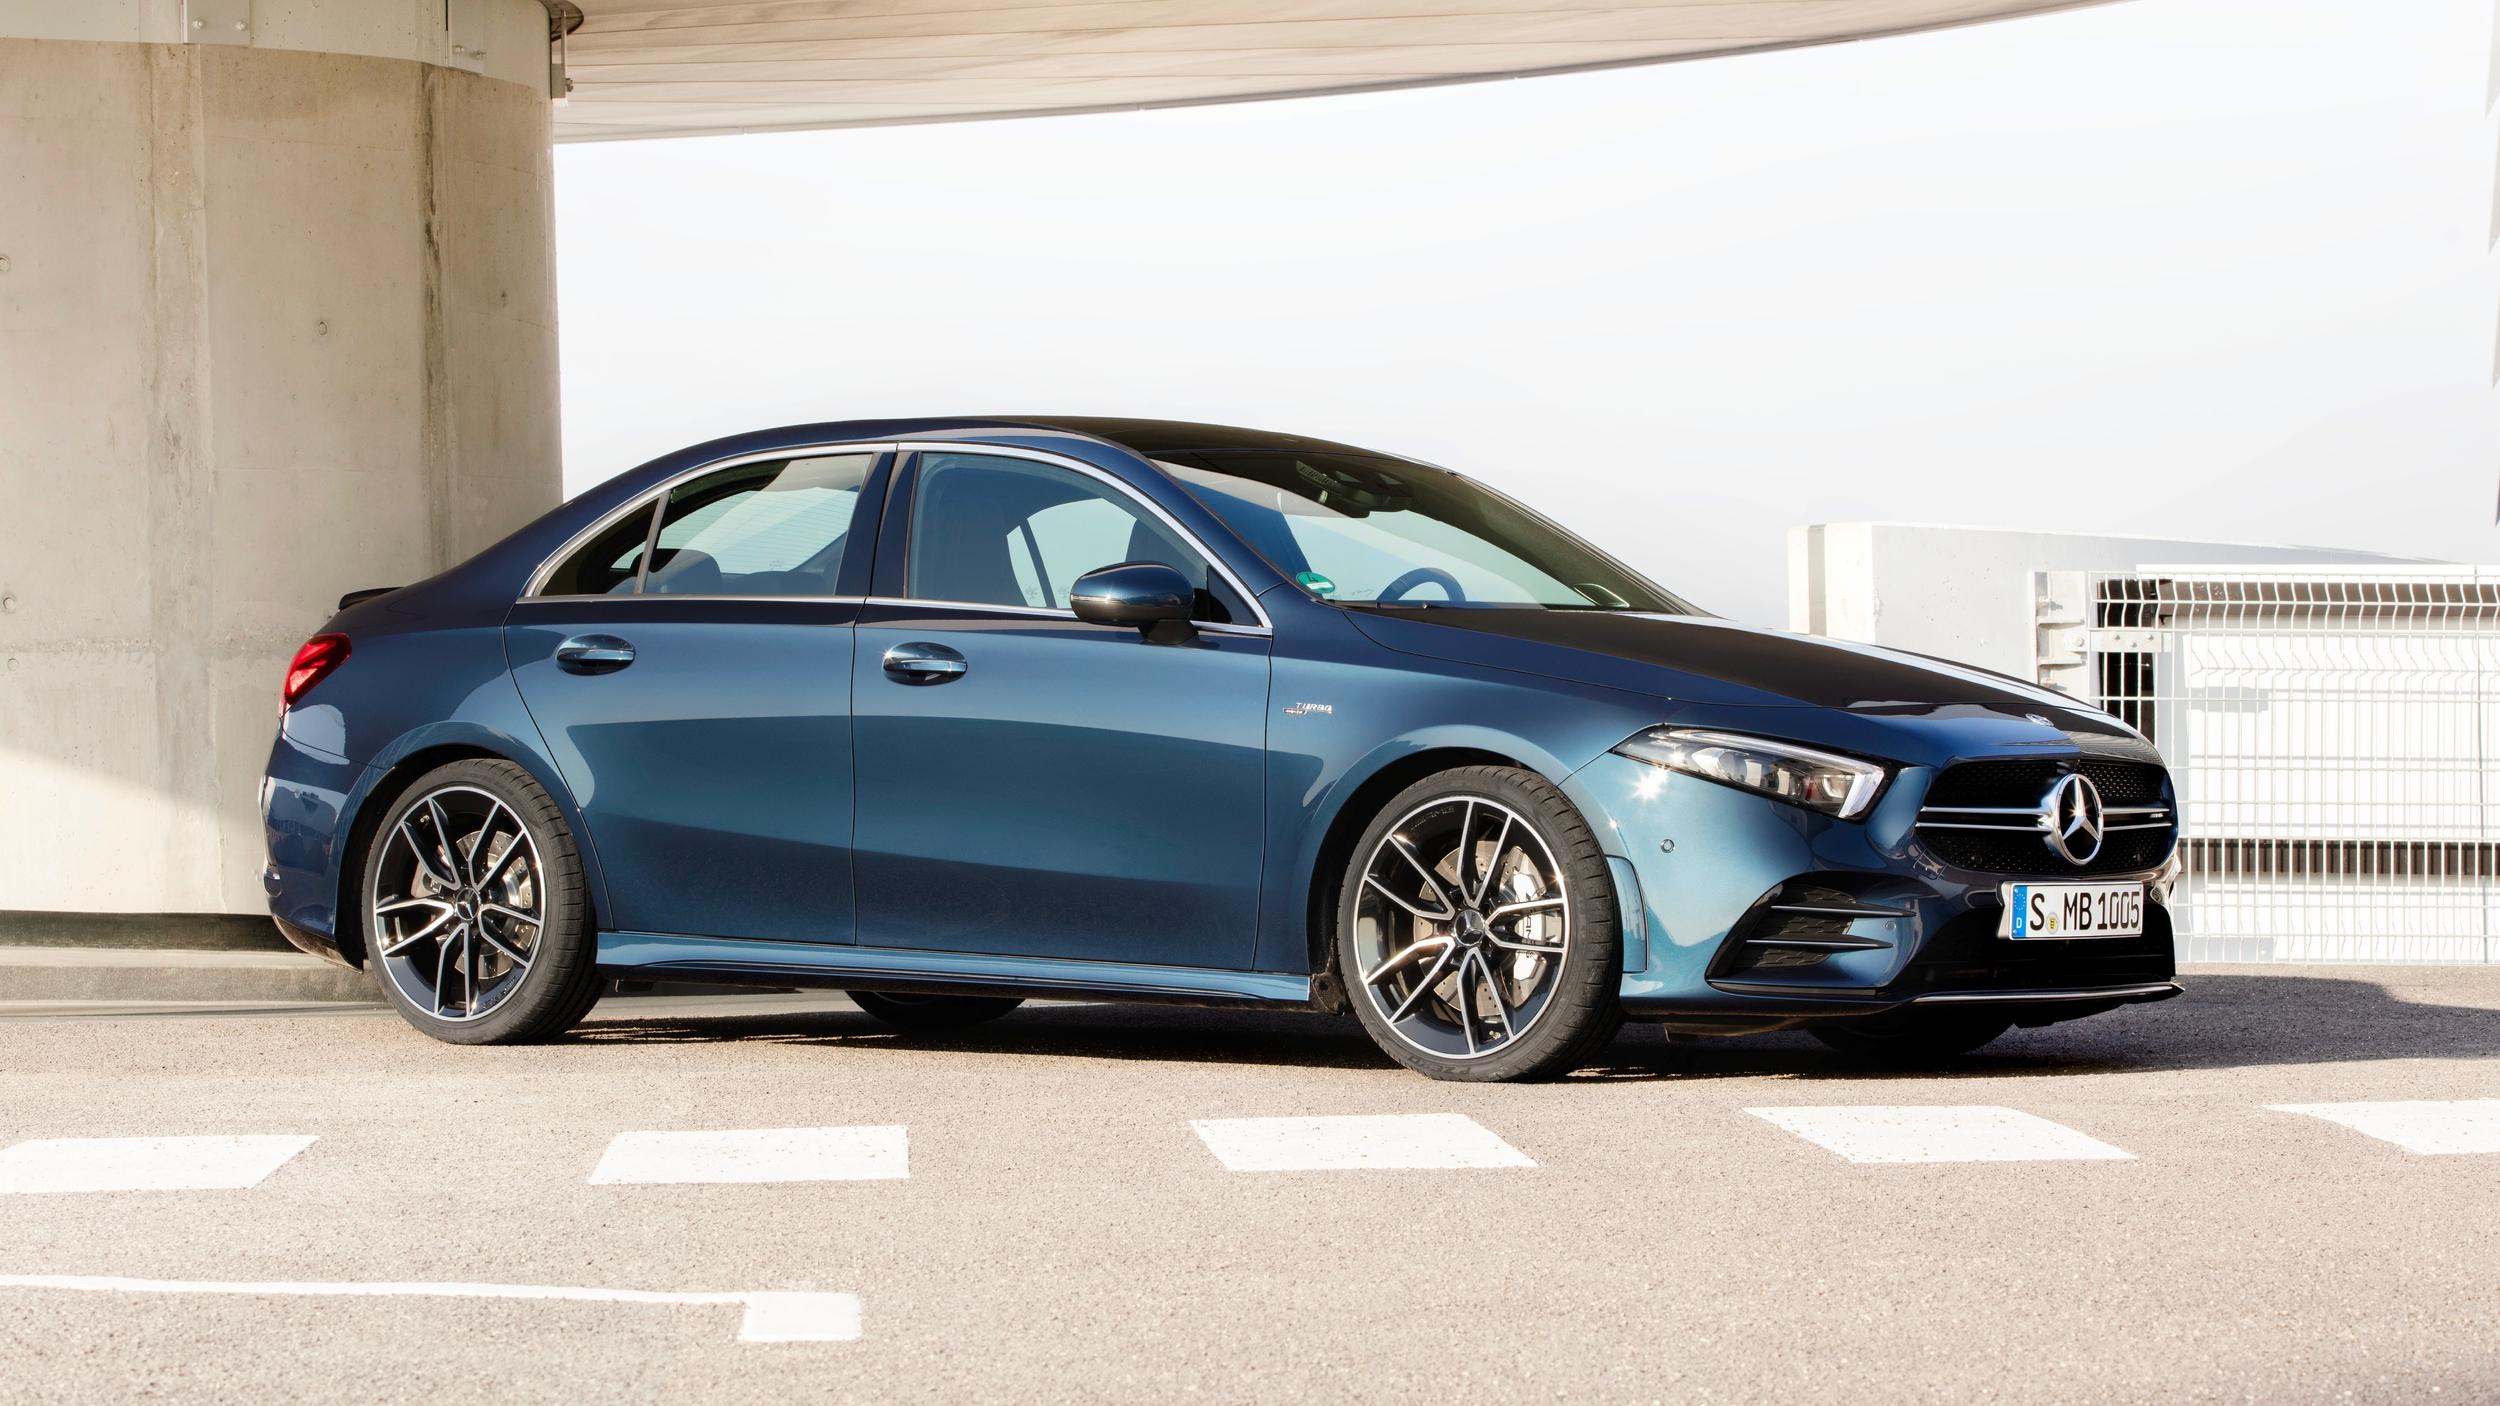 2020 Mercedes-AMG A 35, 300 beygir gücüyle geliyor